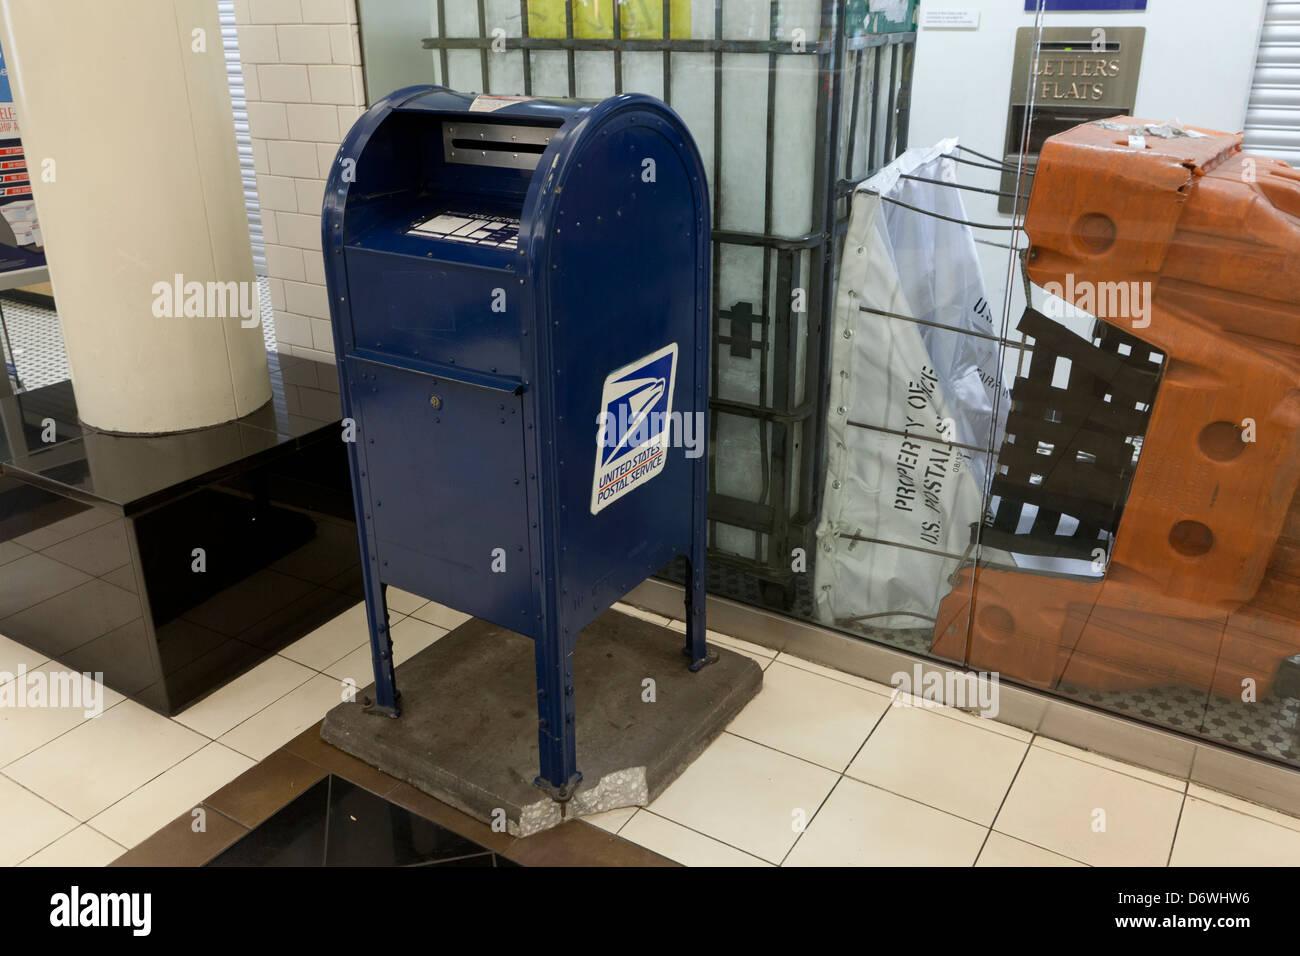 USPS mailbox - Stock Image